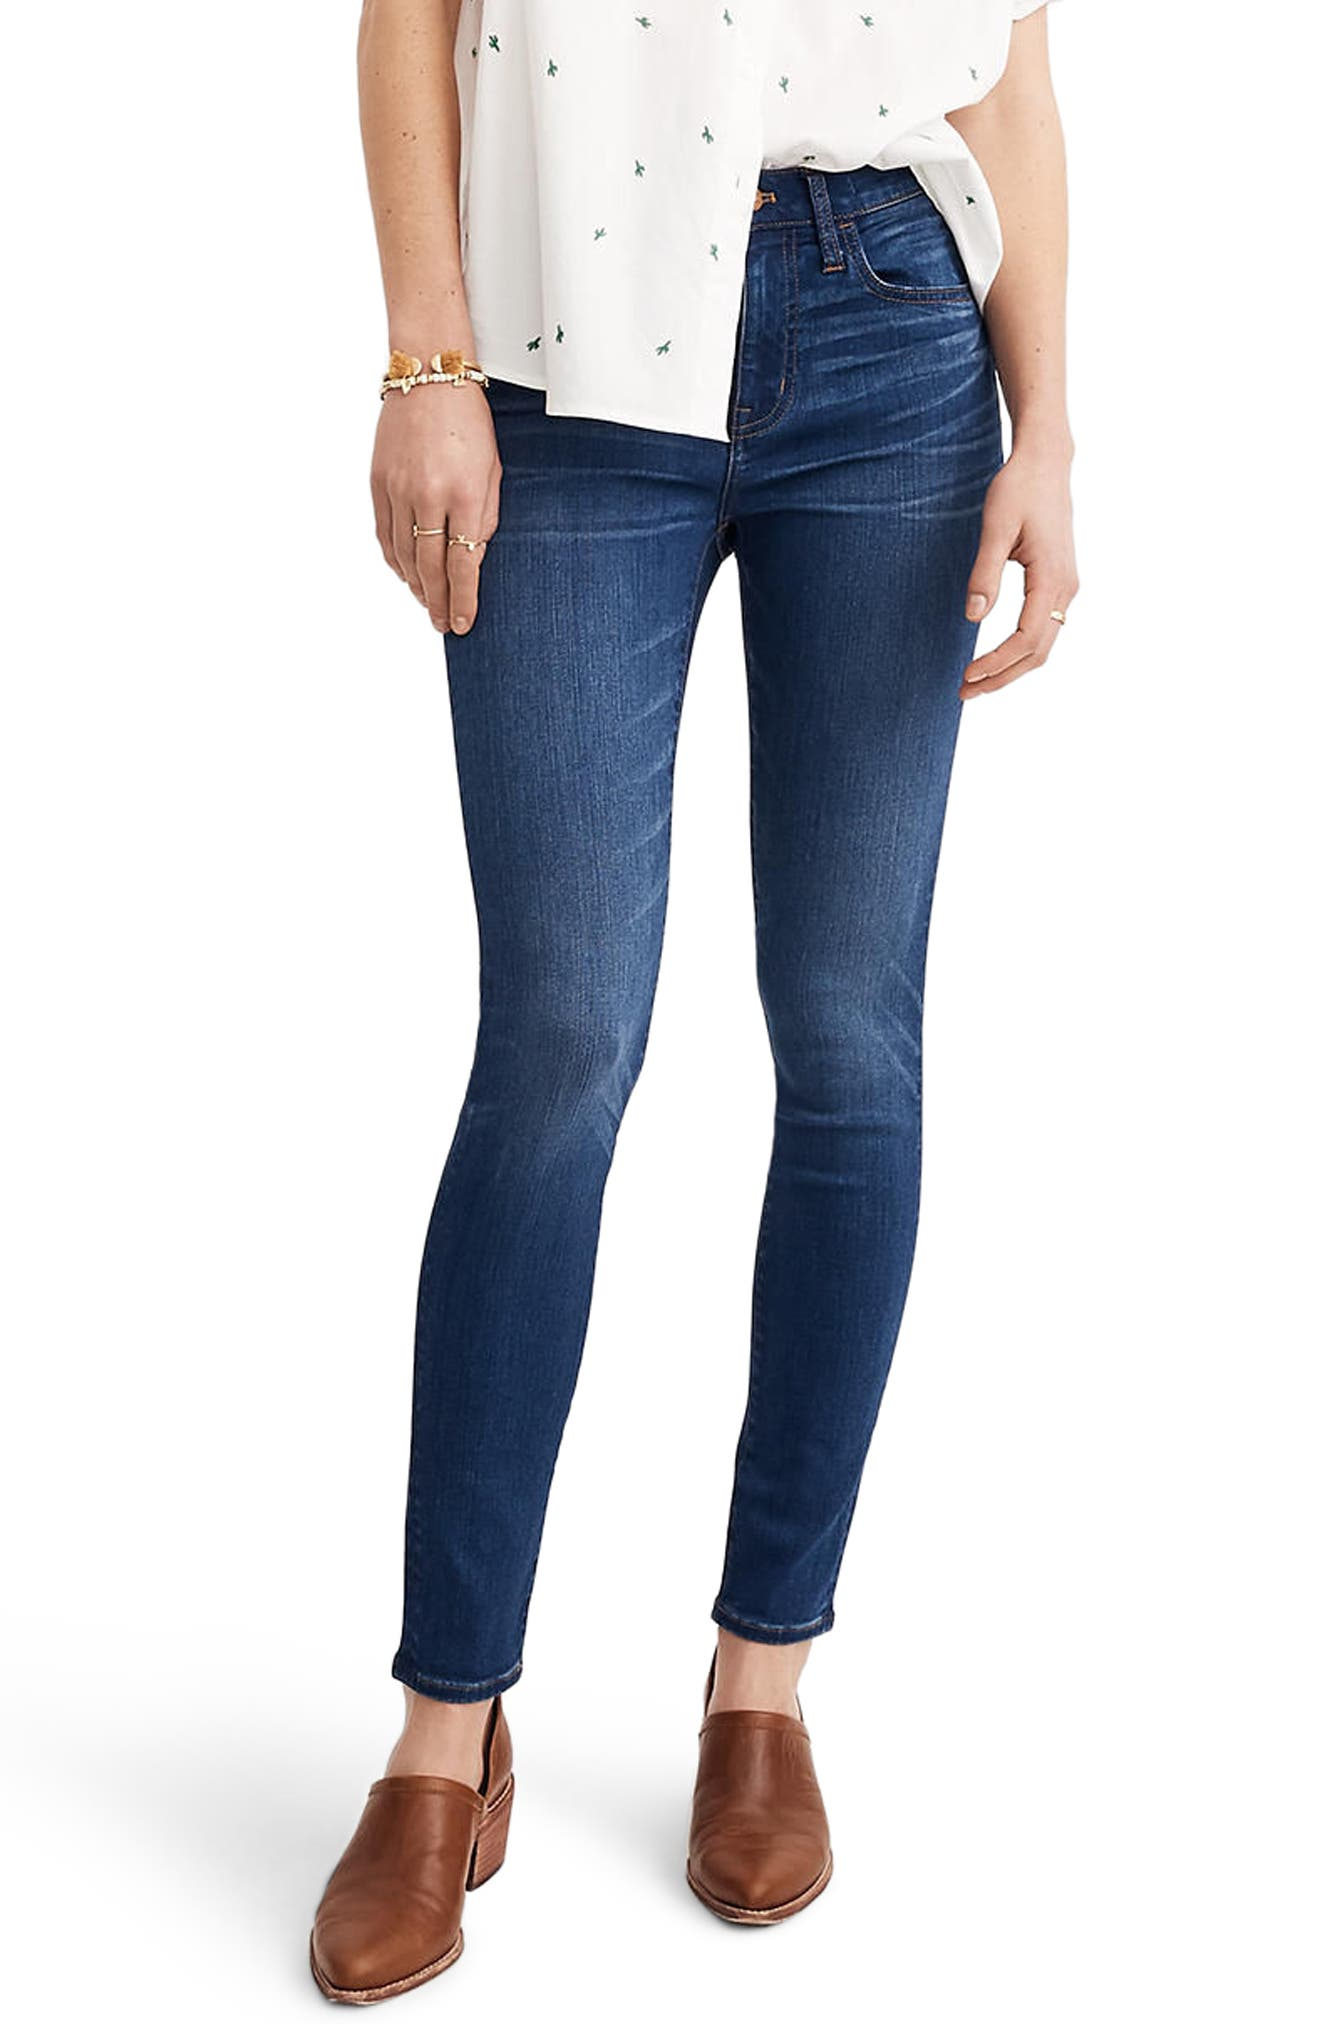 Roadtripper High Waist Skinny Jeans,                         Main,                         color, Orson Wash